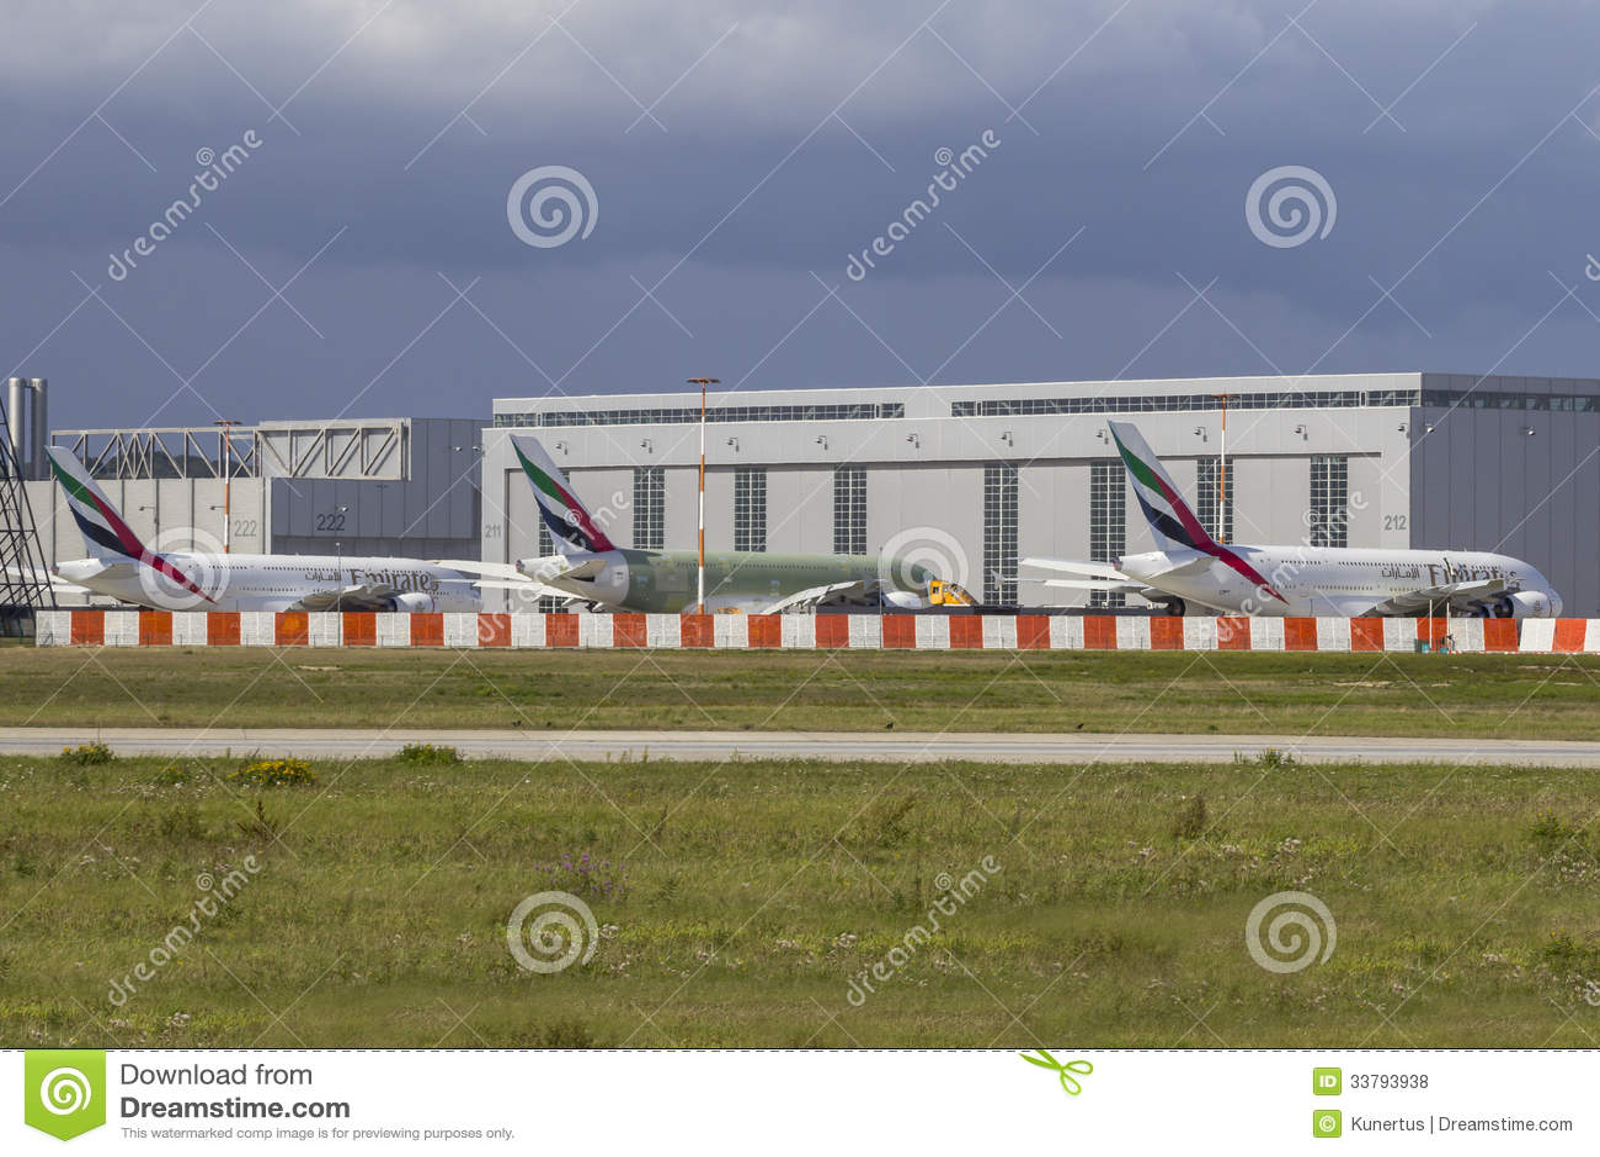 three emirates airbus a380 editorial stock photo image 33793938. Black Bedroom Furniture Sets. Home Design Ideas